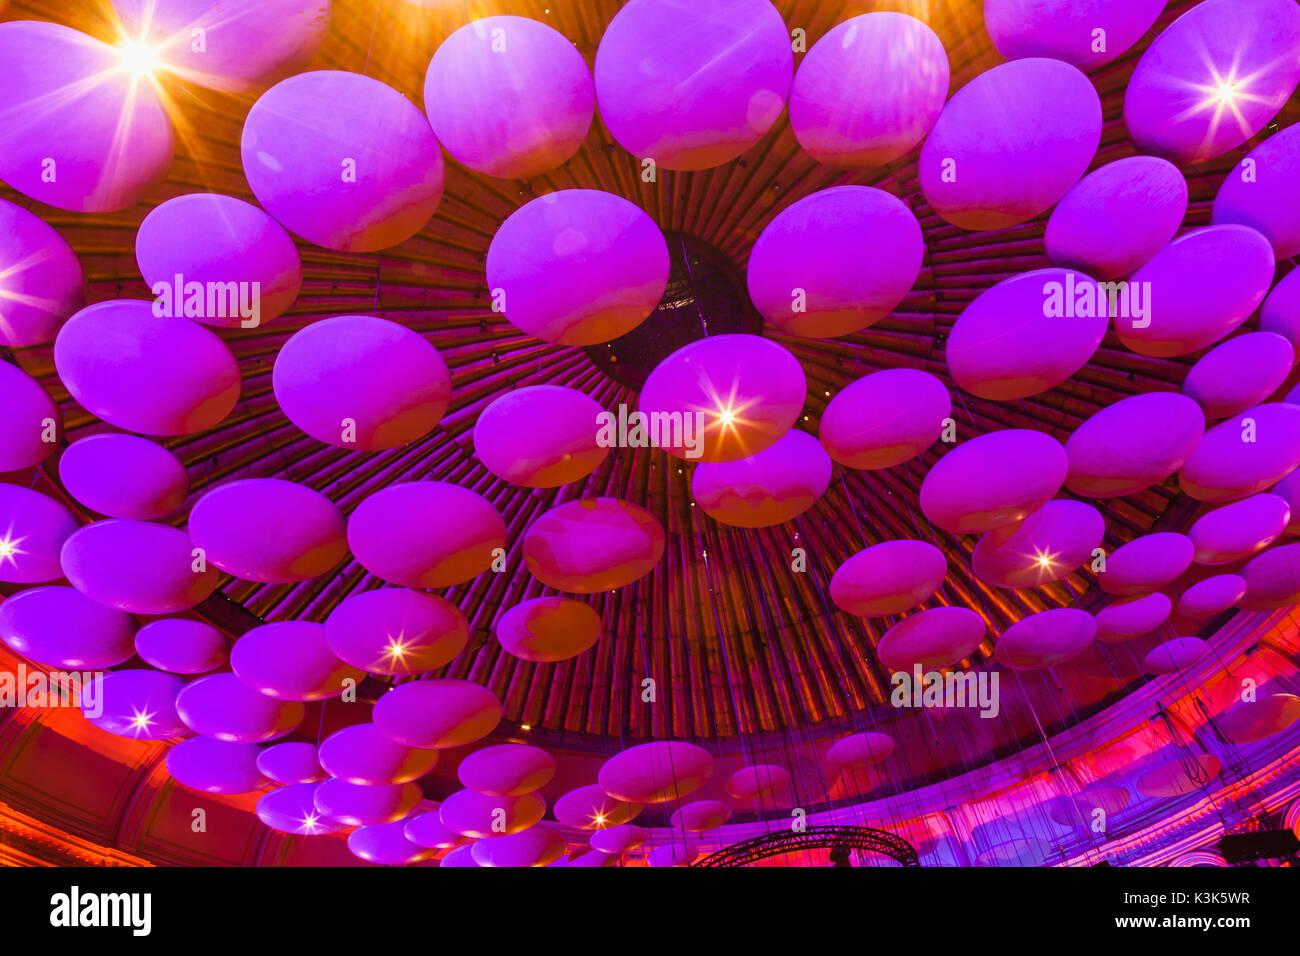 England, London, Royal Albert Hall, Glass Fibre Acoustics Reflectors - Stock Image